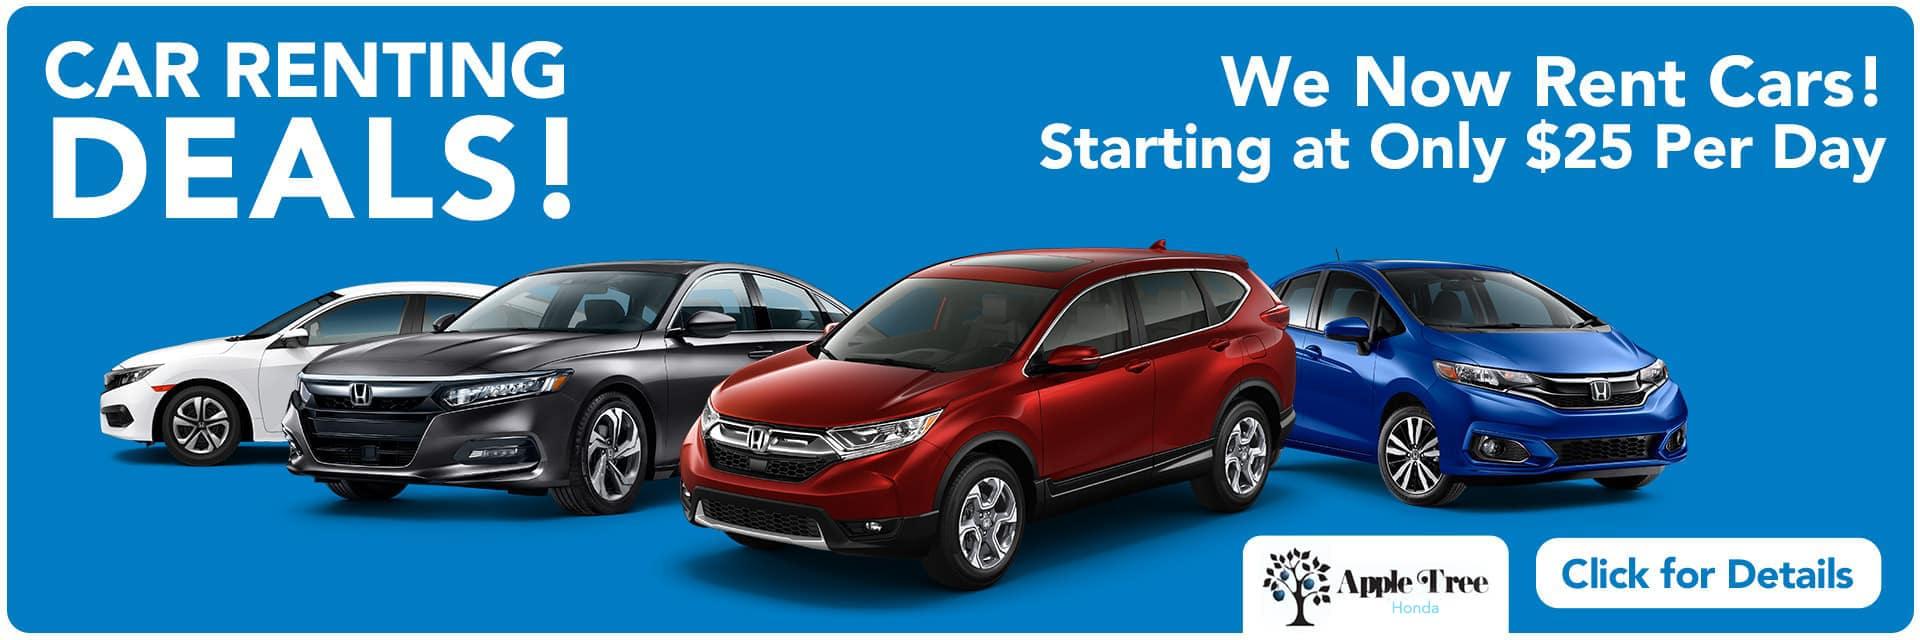 https://di-uploads-pod11.dealerinspire.com/appletreehonda/uploads/2018/06/we-now-rent-cars.jpg